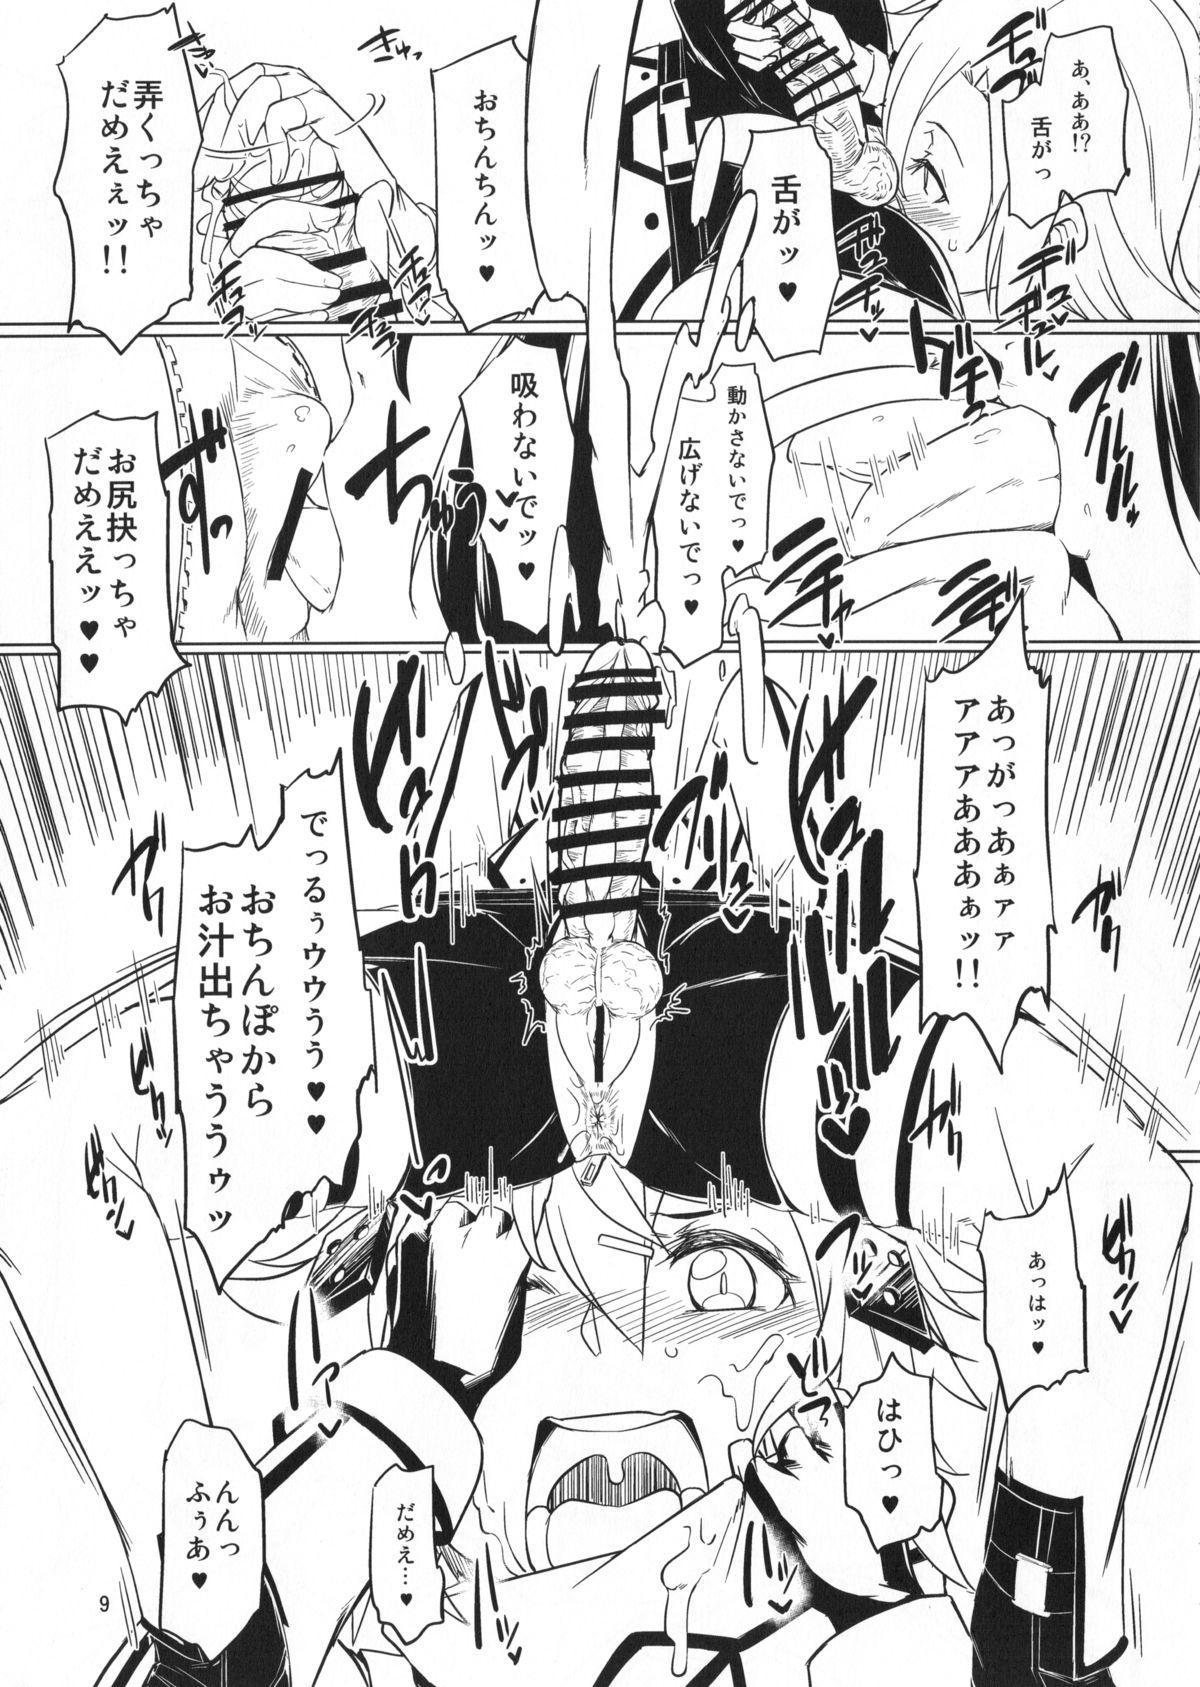 Sogekishu to Oshiri Ijiri Au Hon 8